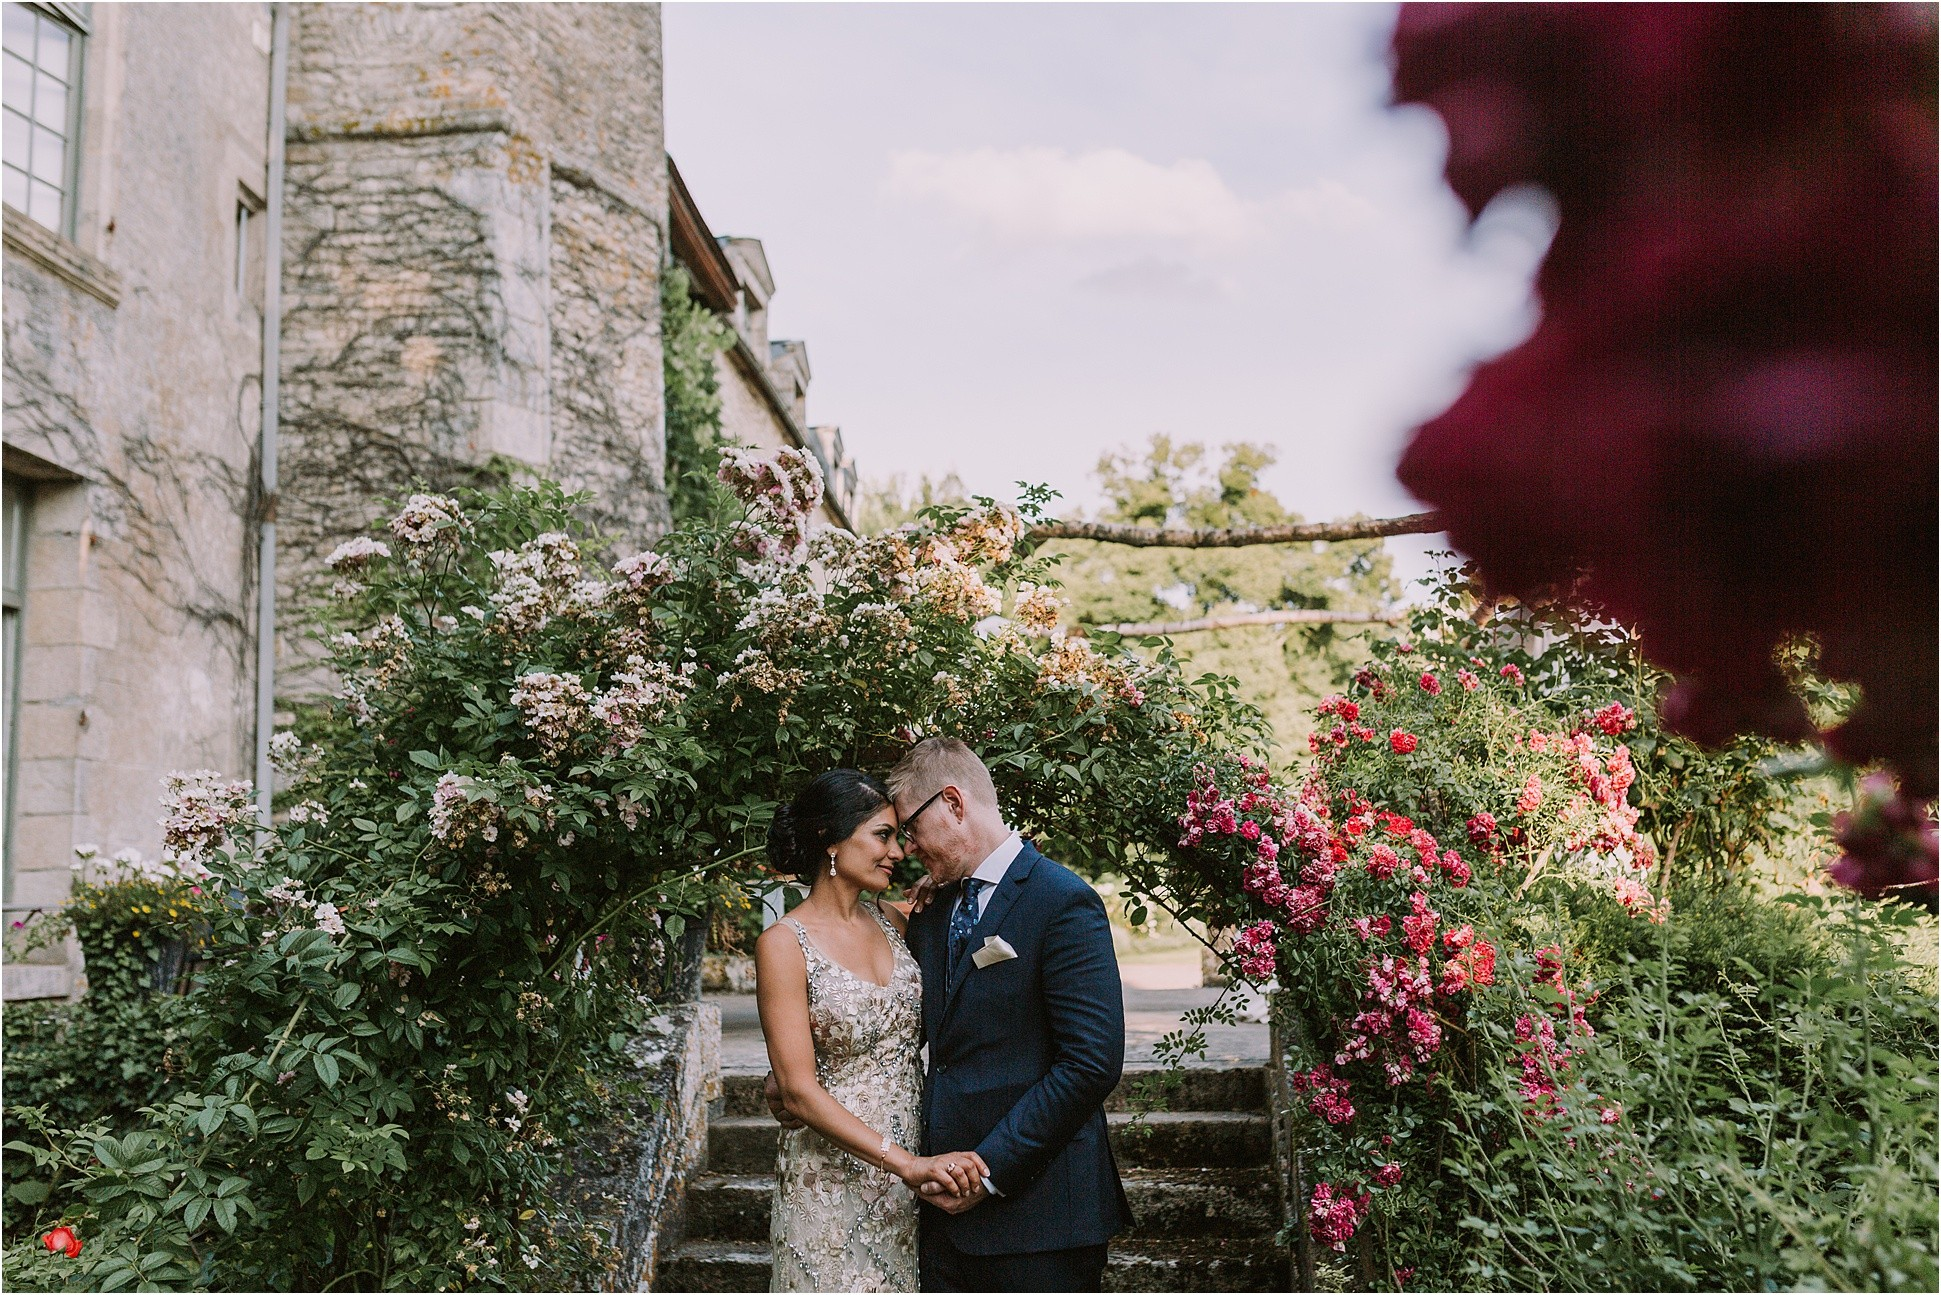 Kateryna-photos-photographe-mariage-chateau-st-paterne-mayenne-normandie_0175.jpg